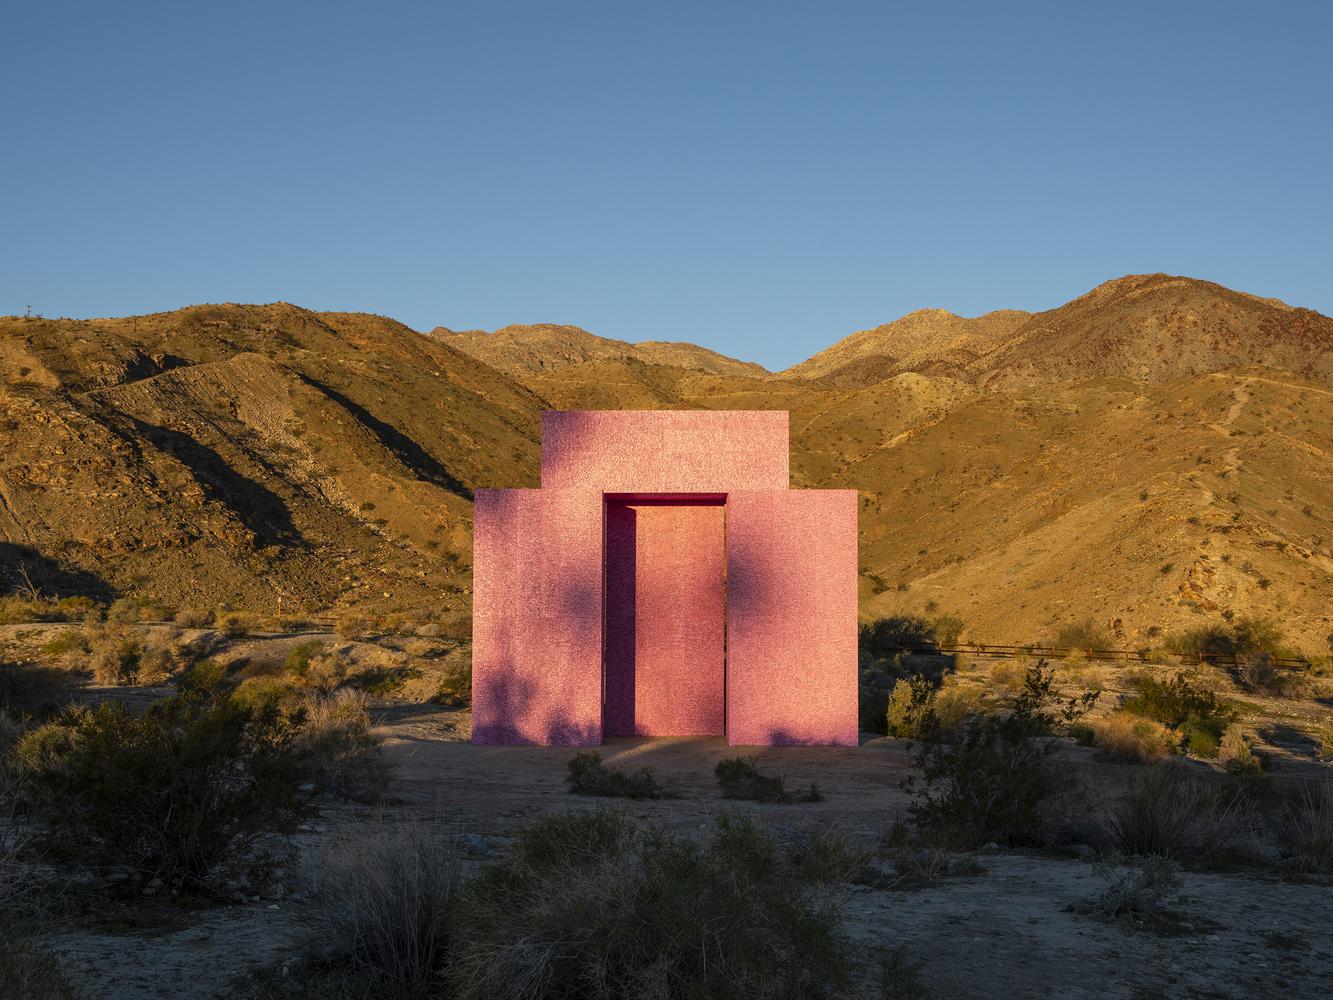 desert x | 2019 - Exhibition Dates <> 09 February 2019 <> 21 April 2019